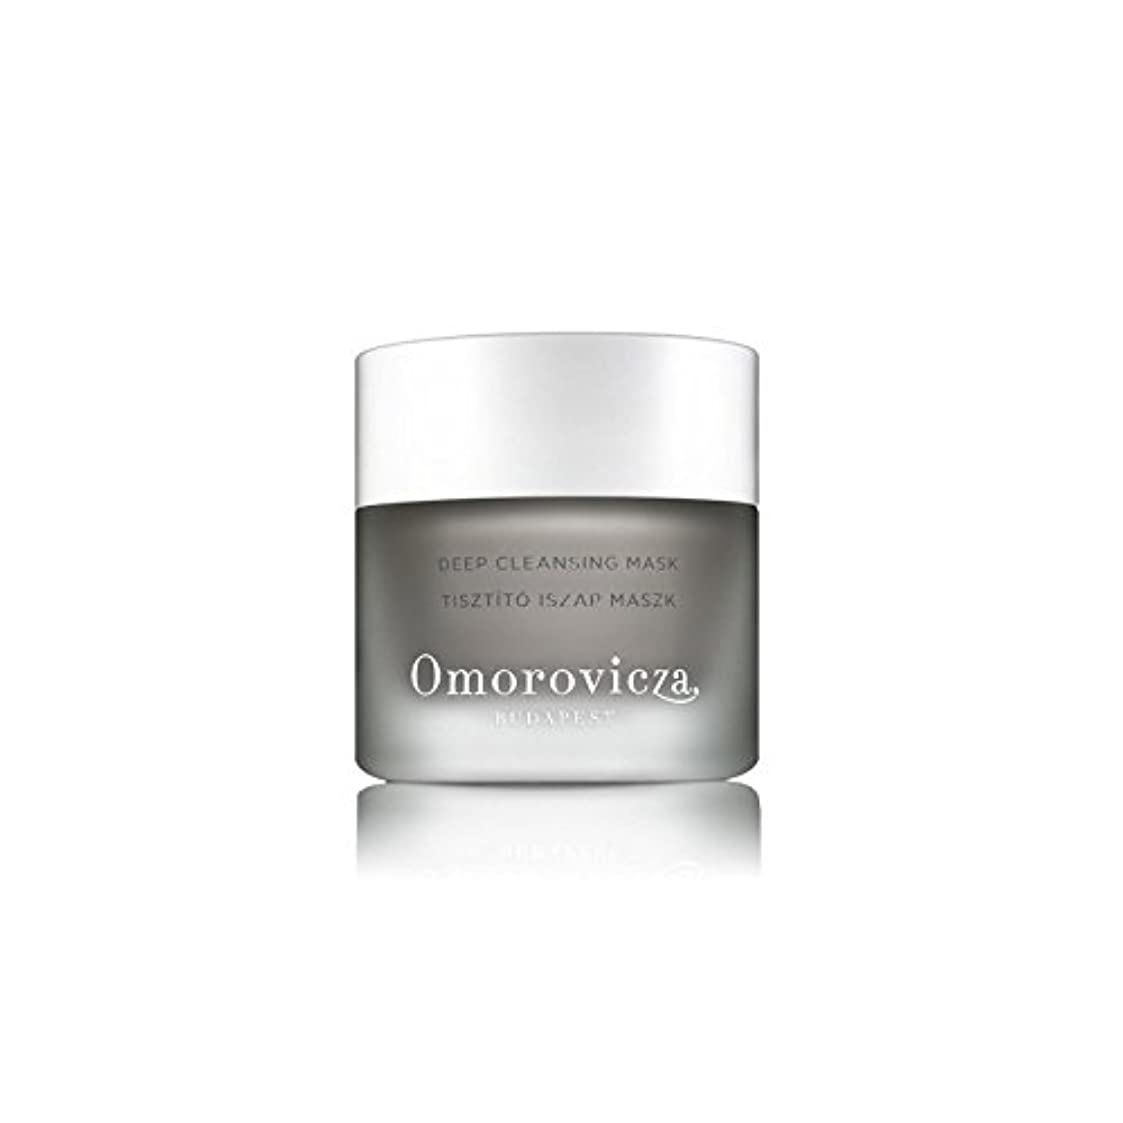 Omorovicza Deep Cleansing Mask (50ml) (Pack of 6) - ディープクレンジングマスク(50ミリリットル) x6 [並行輸入品]